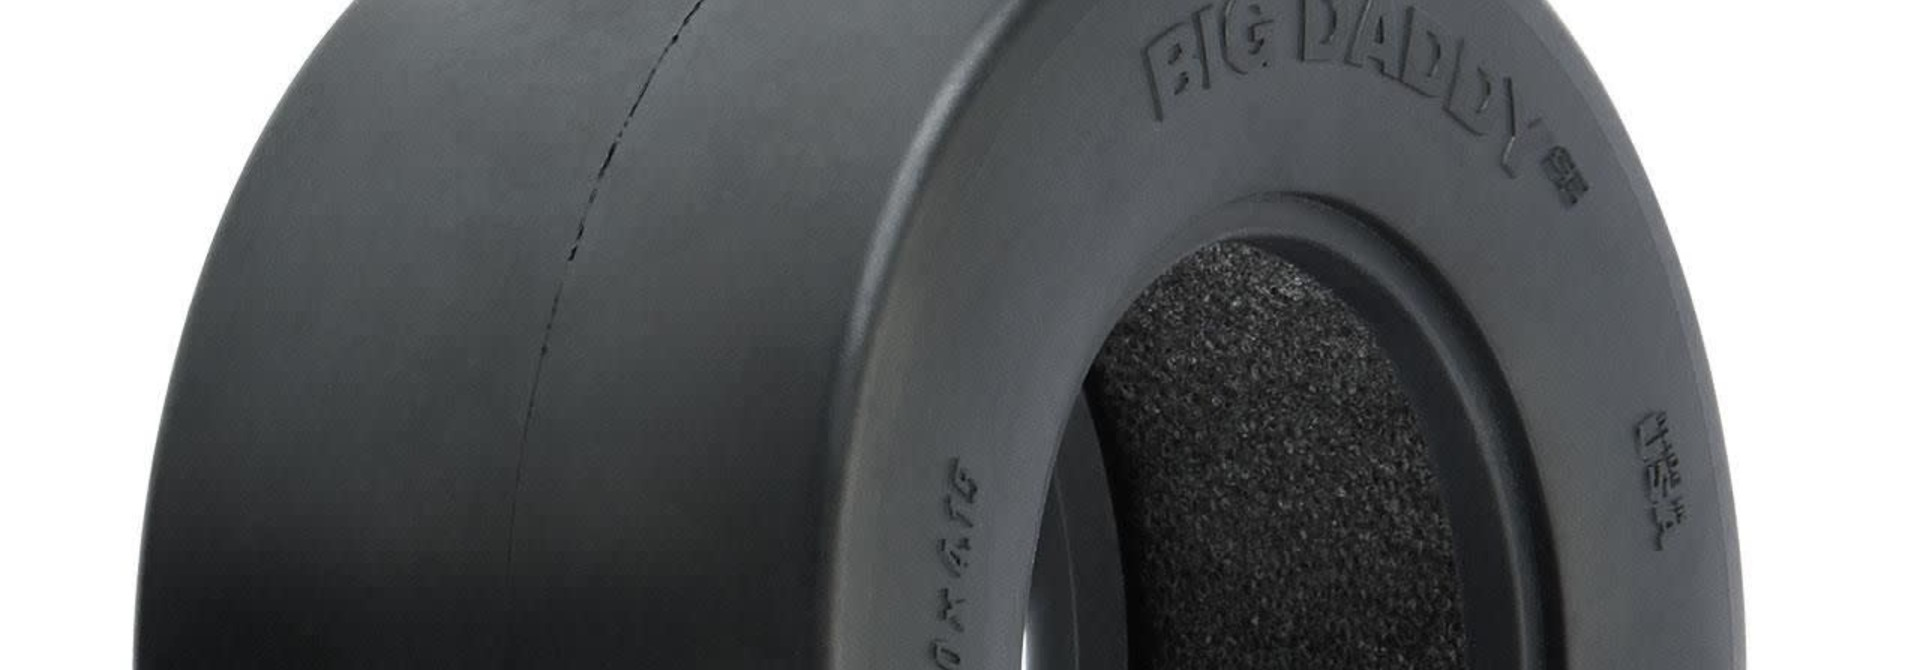 Big Daddy Wide Drag Slick SC 2.2/3.0 MC (Clay) Drag Racing Tires (2) for SC Trucks Rear